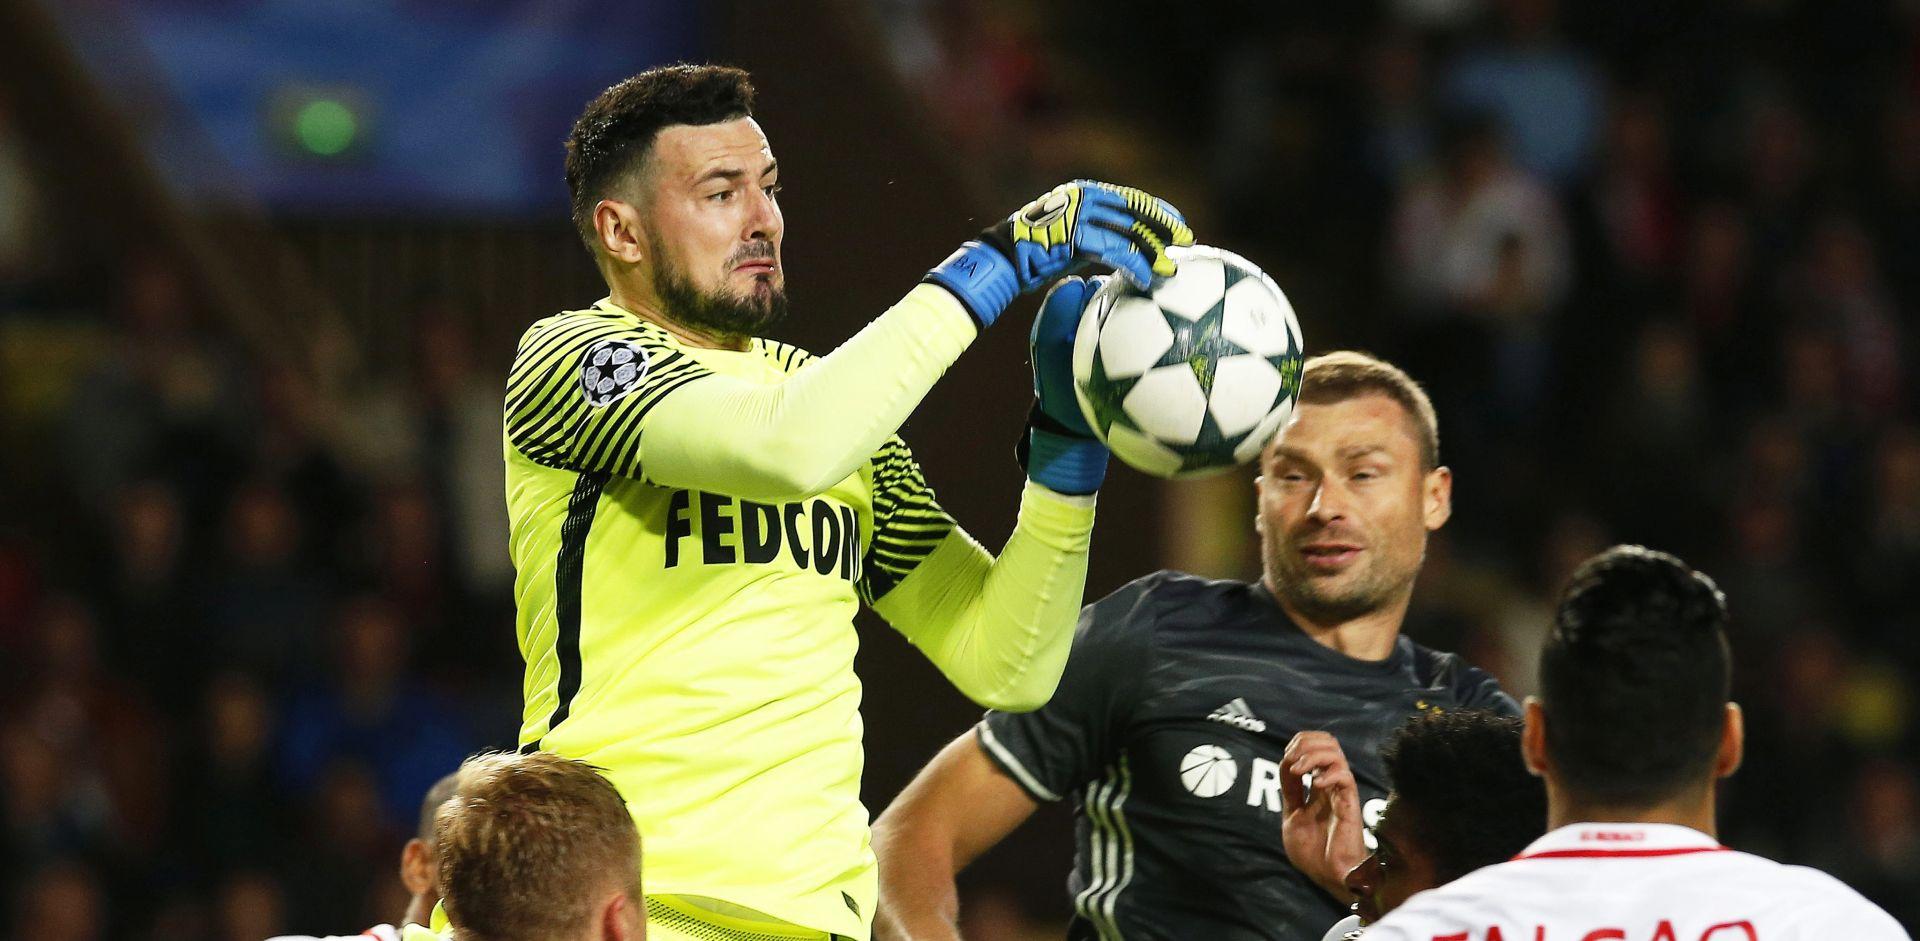 VIDEO: Monaco privremeno preuzeo vodstvo, Lorient primio tri komada